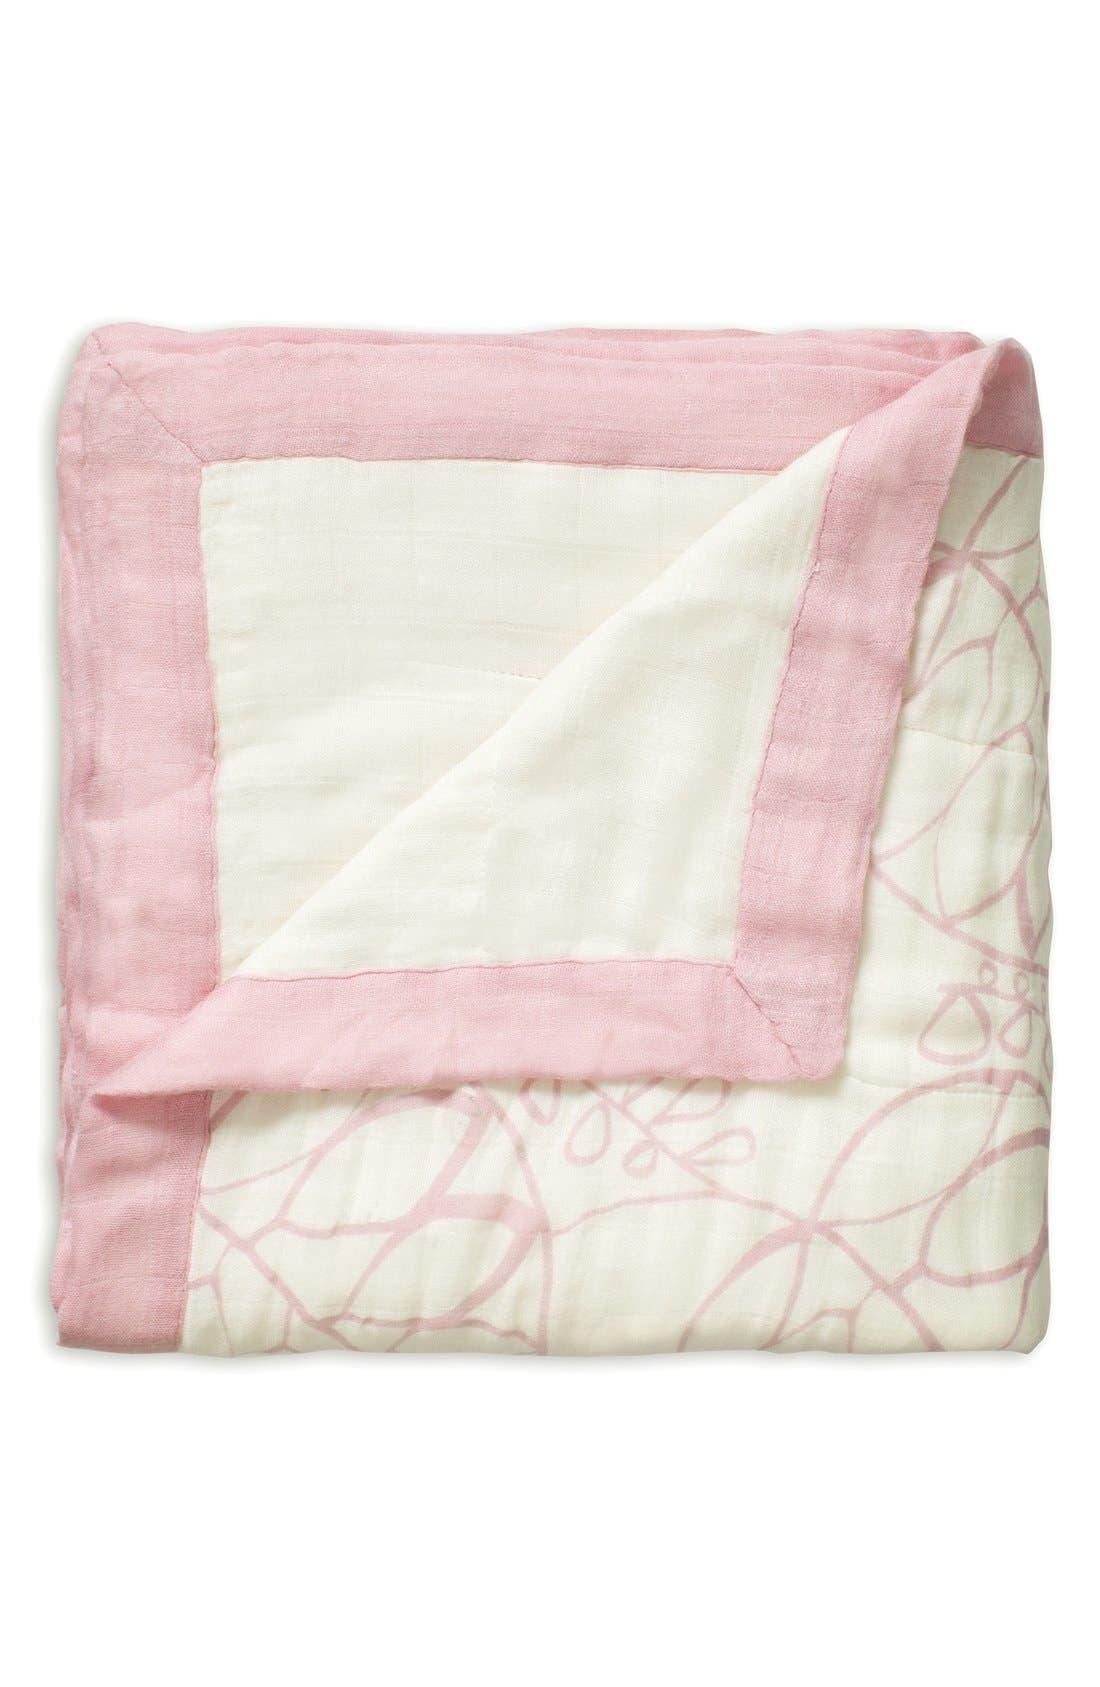 Main Image - aden + anais Dream Blanket